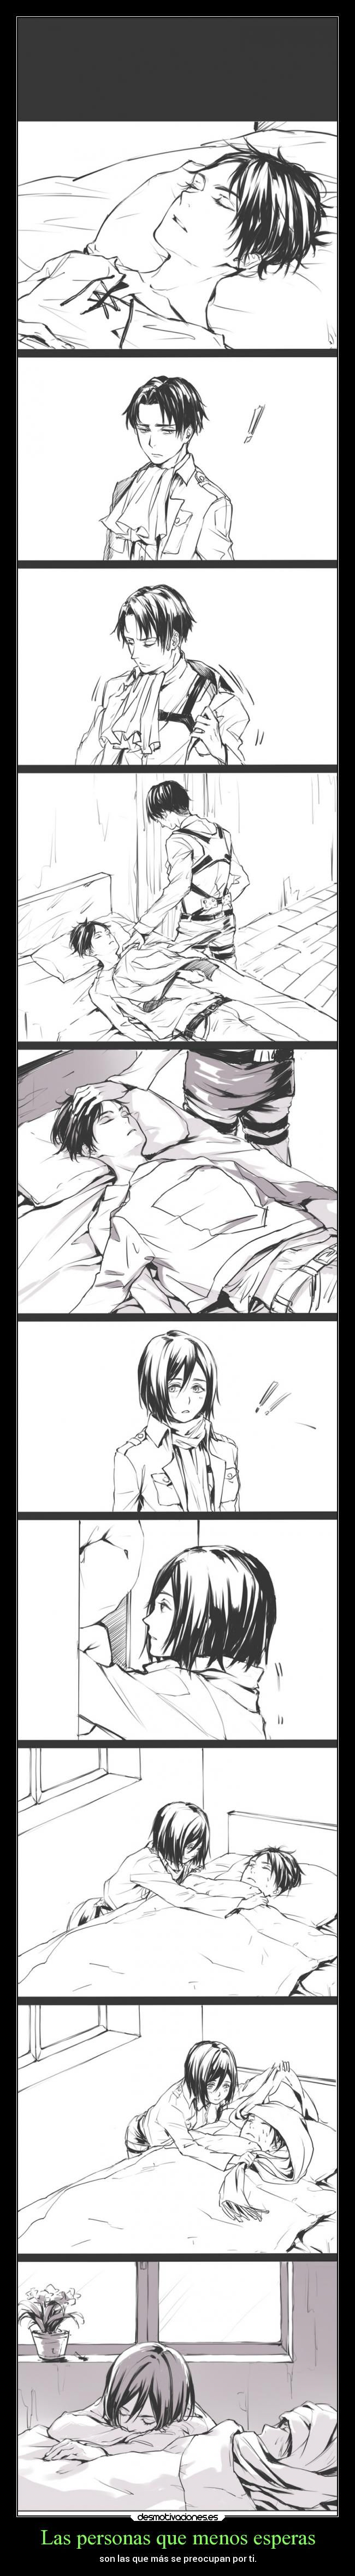 carteles corazon anime amor amigos amistad shingekinokojin levi rivaillie mikasa erenaeger desmotivaciones